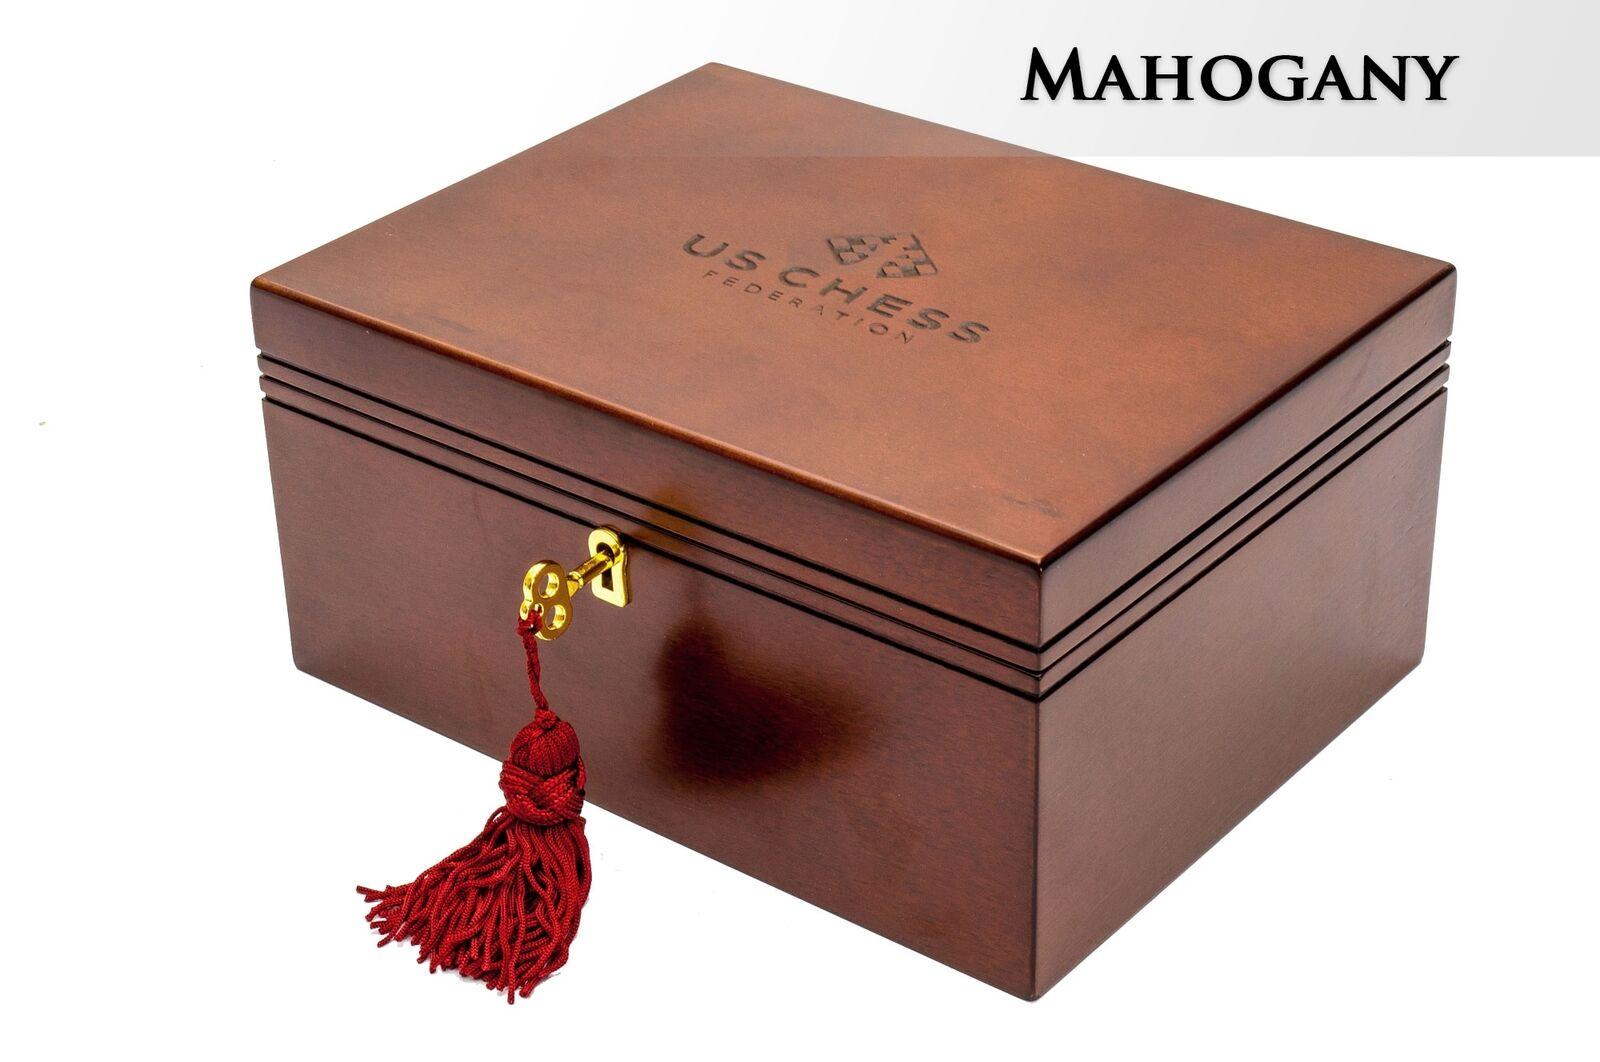 Premium Chess Box, Mahogany, med US CHESS Logo